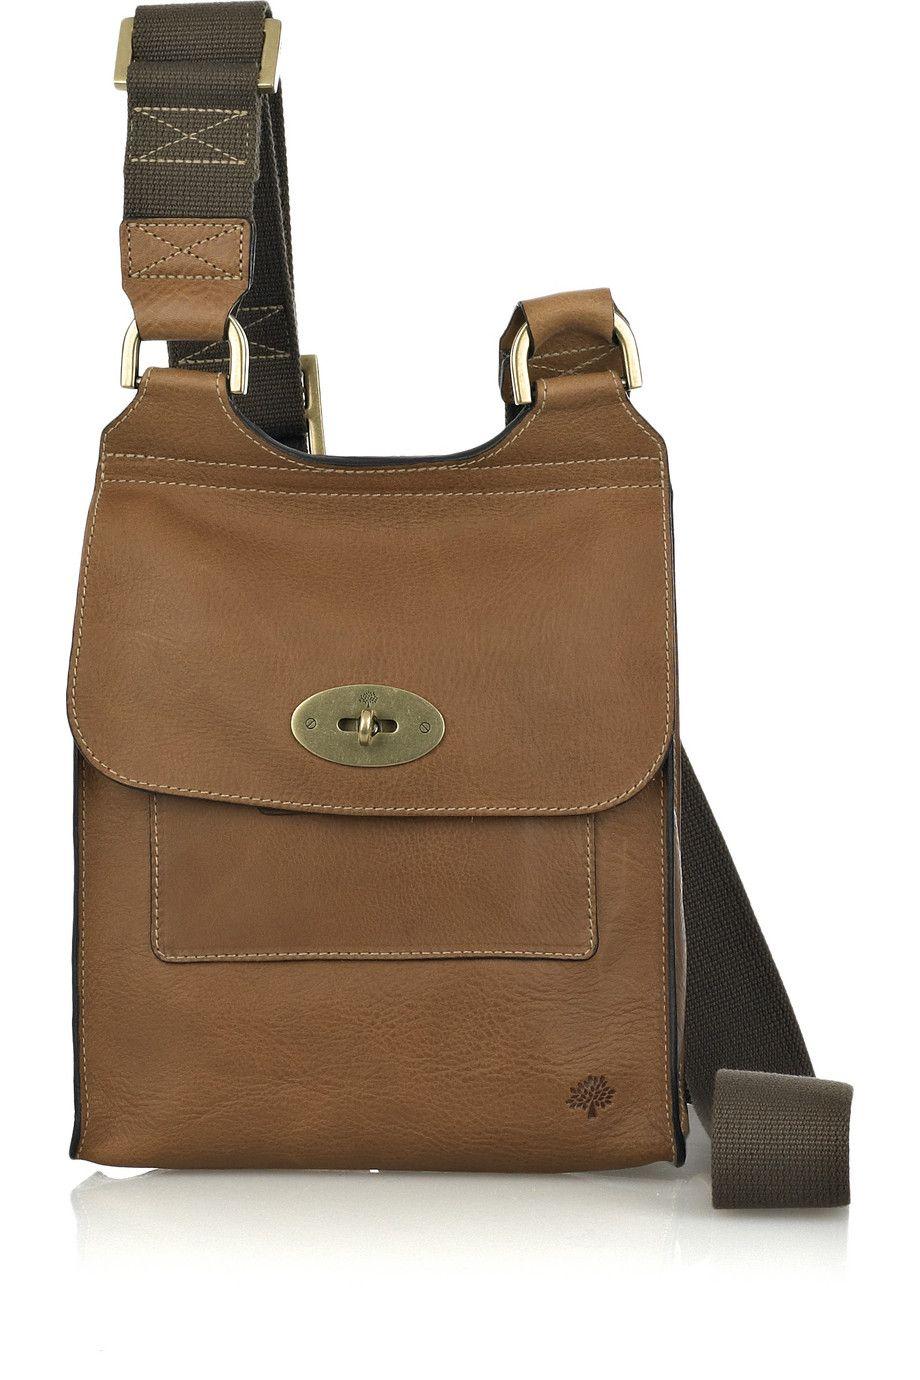 ... shop mulberry antony leather cross body bag net a porter 34b71 ece5c 904daa825b13f